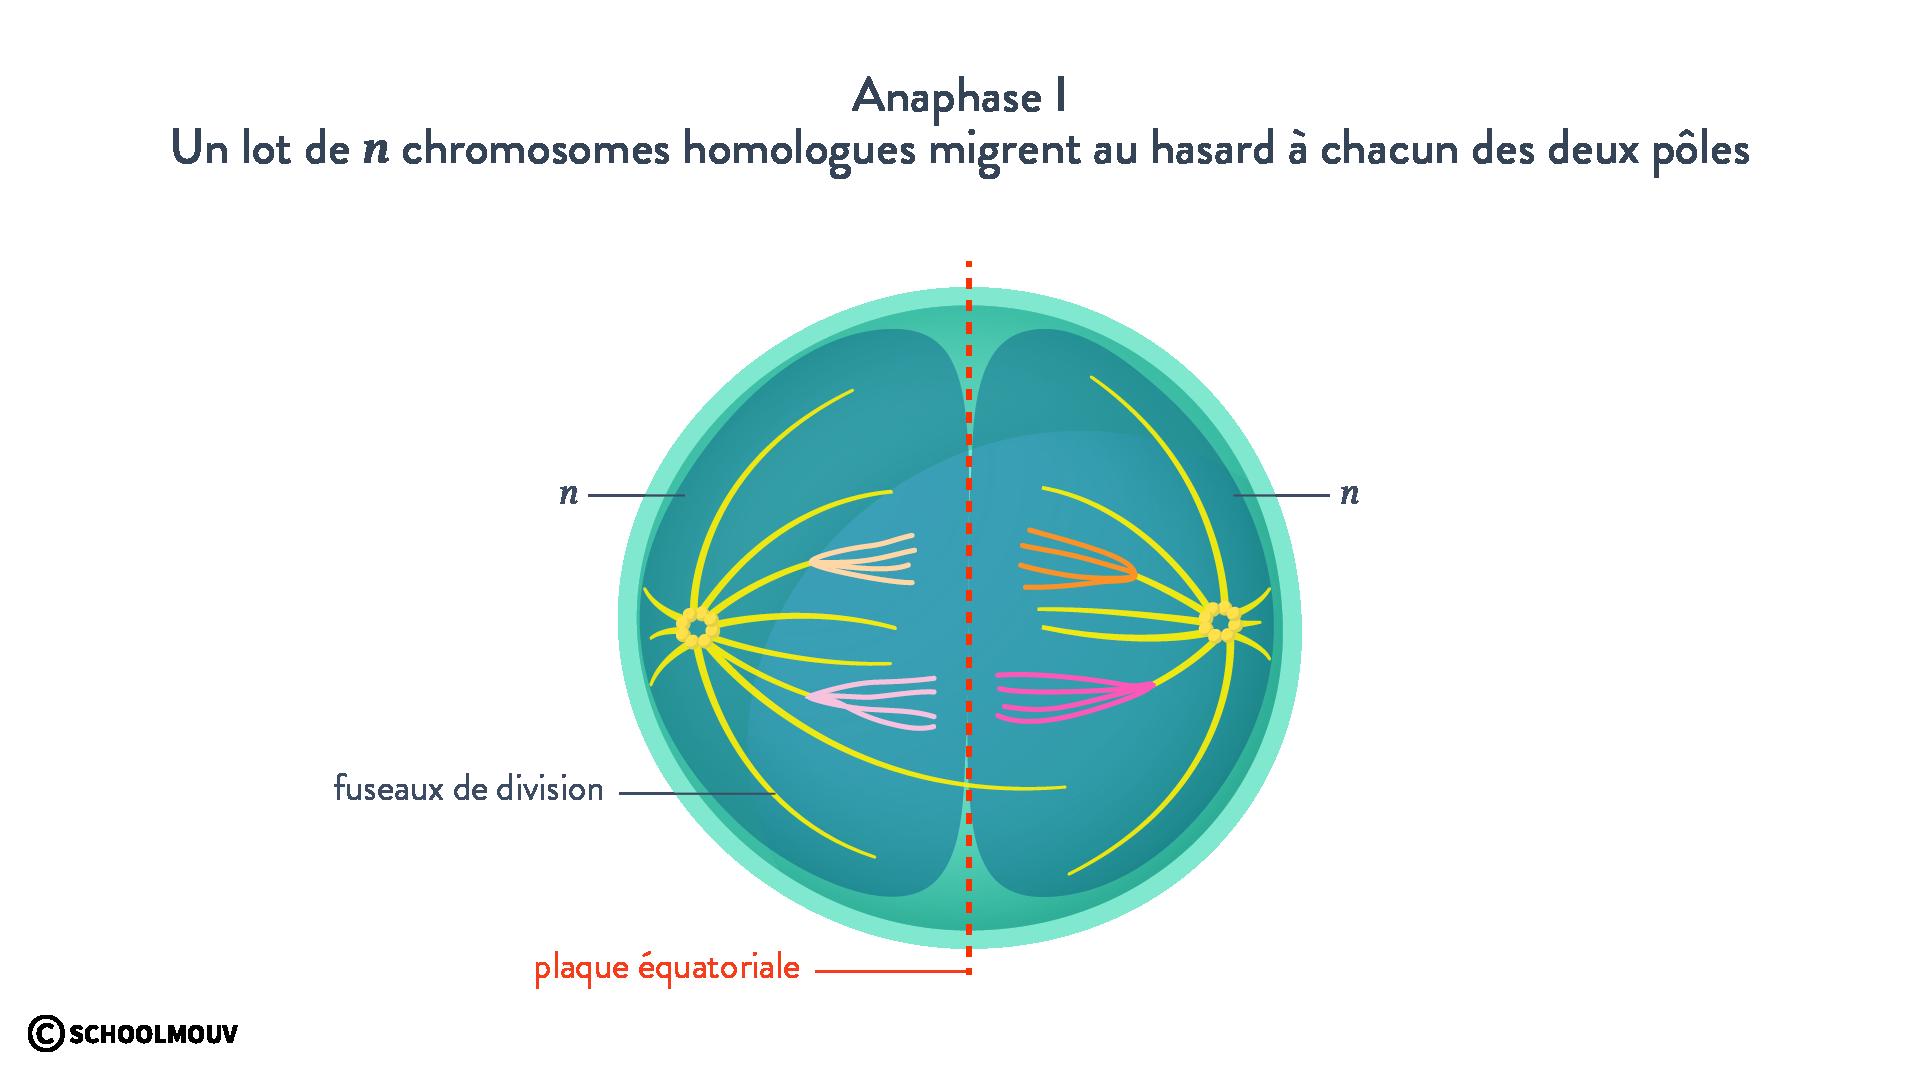 Anaphase I méiose